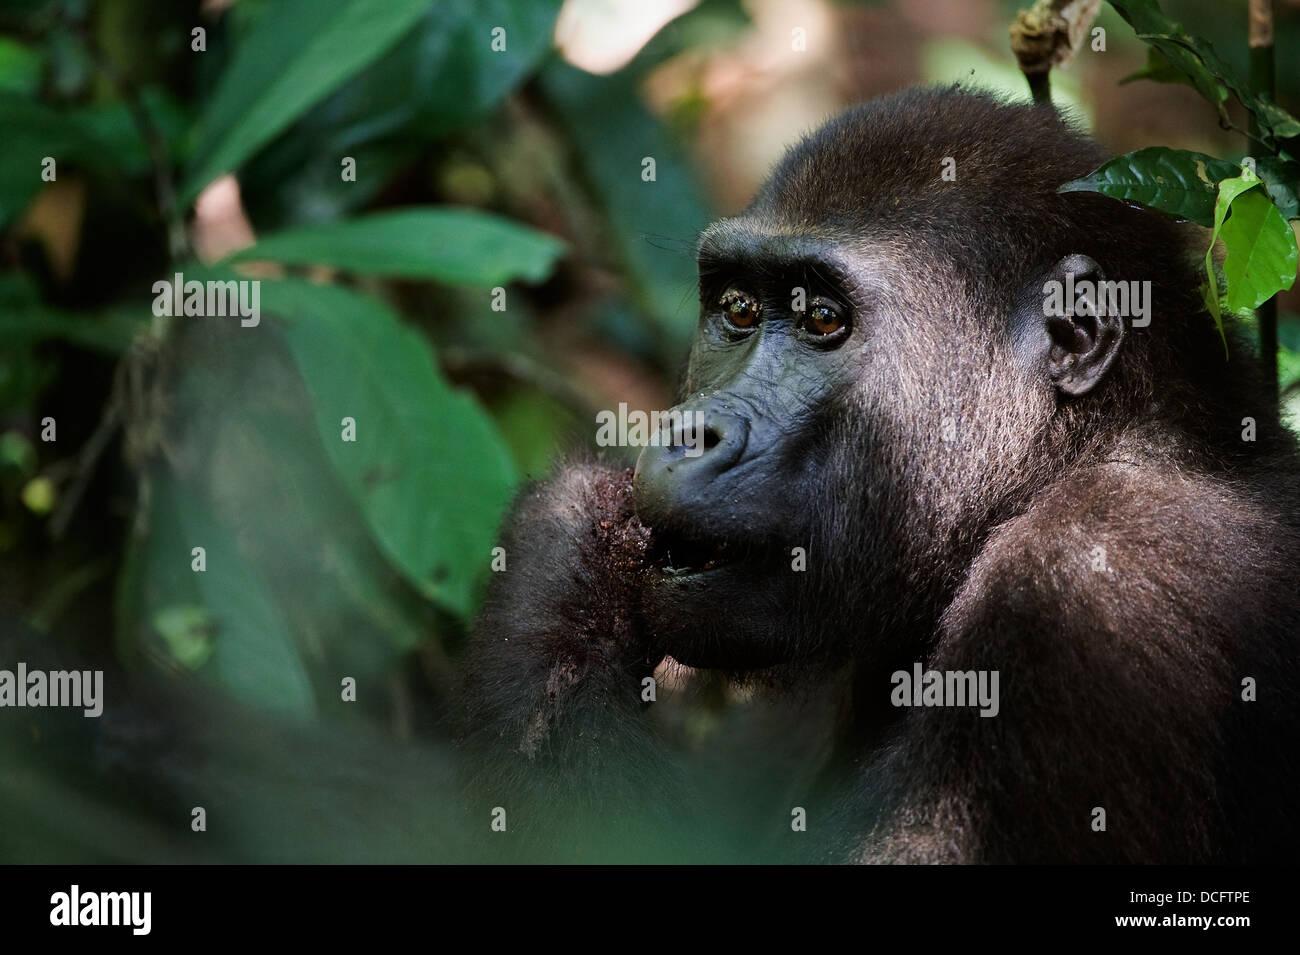 Strong Ape Stock Photos & Strong Ape Stock Images - Alamy